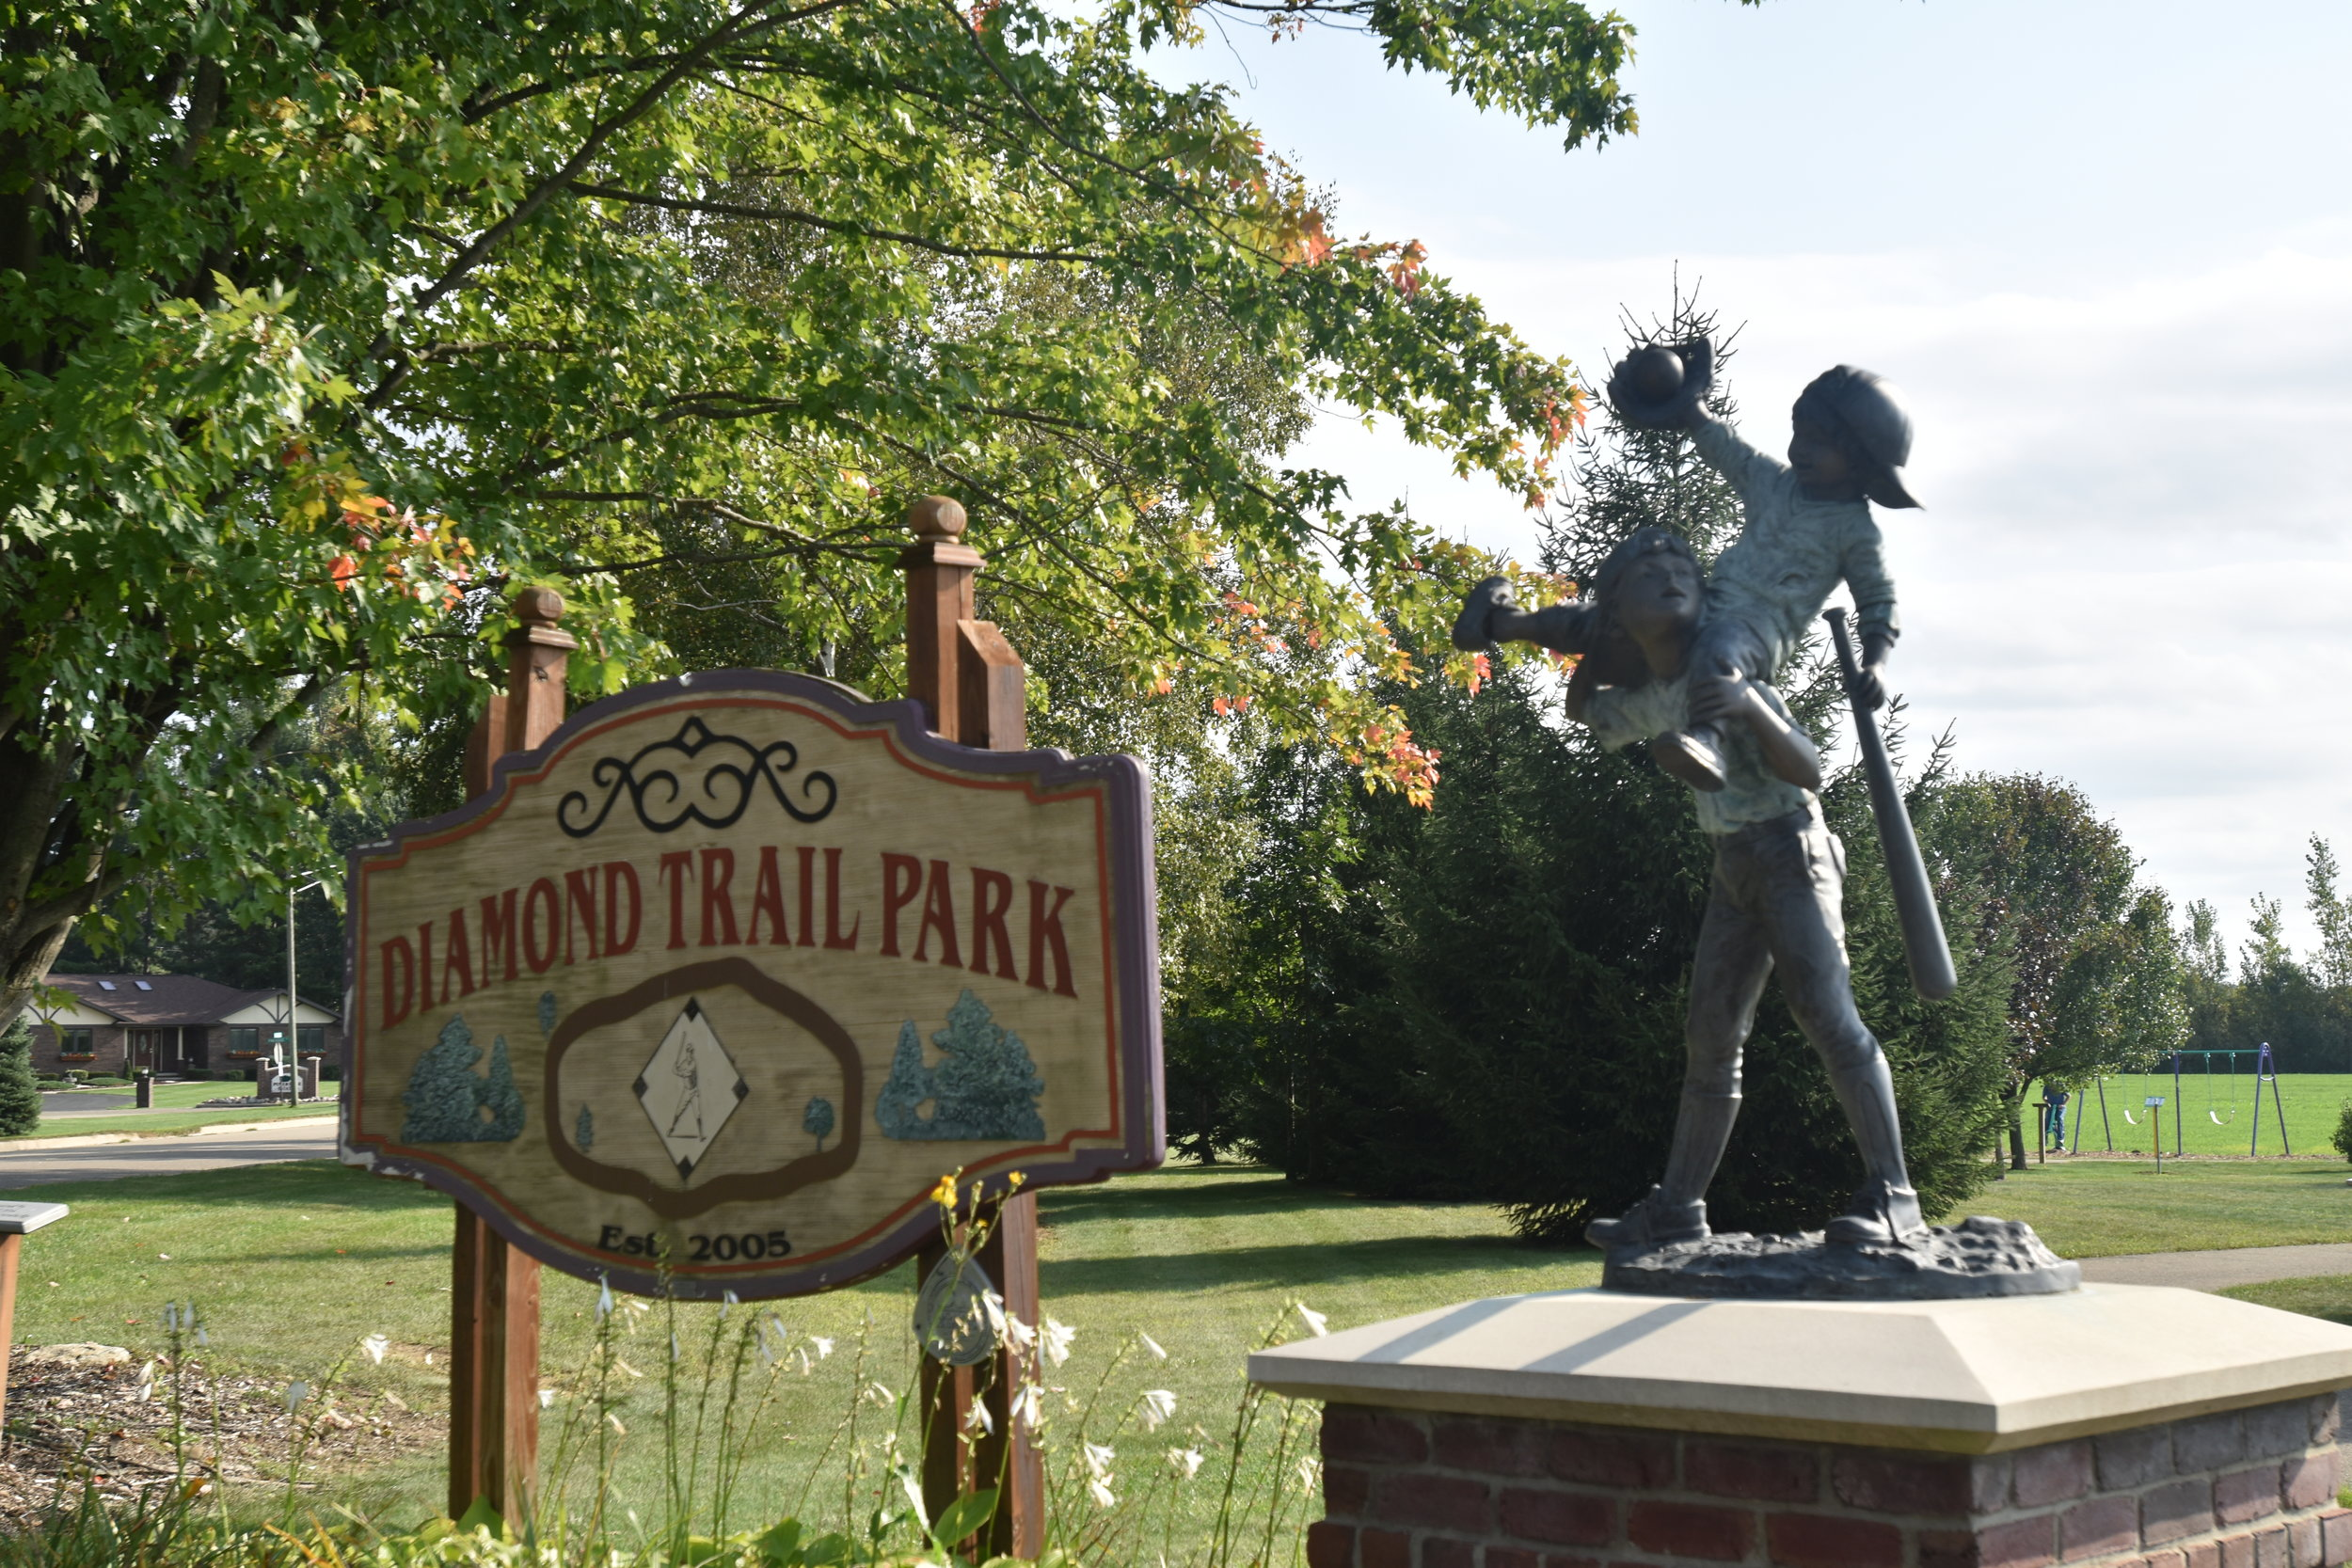 Diamond Trail Park in Sandusky